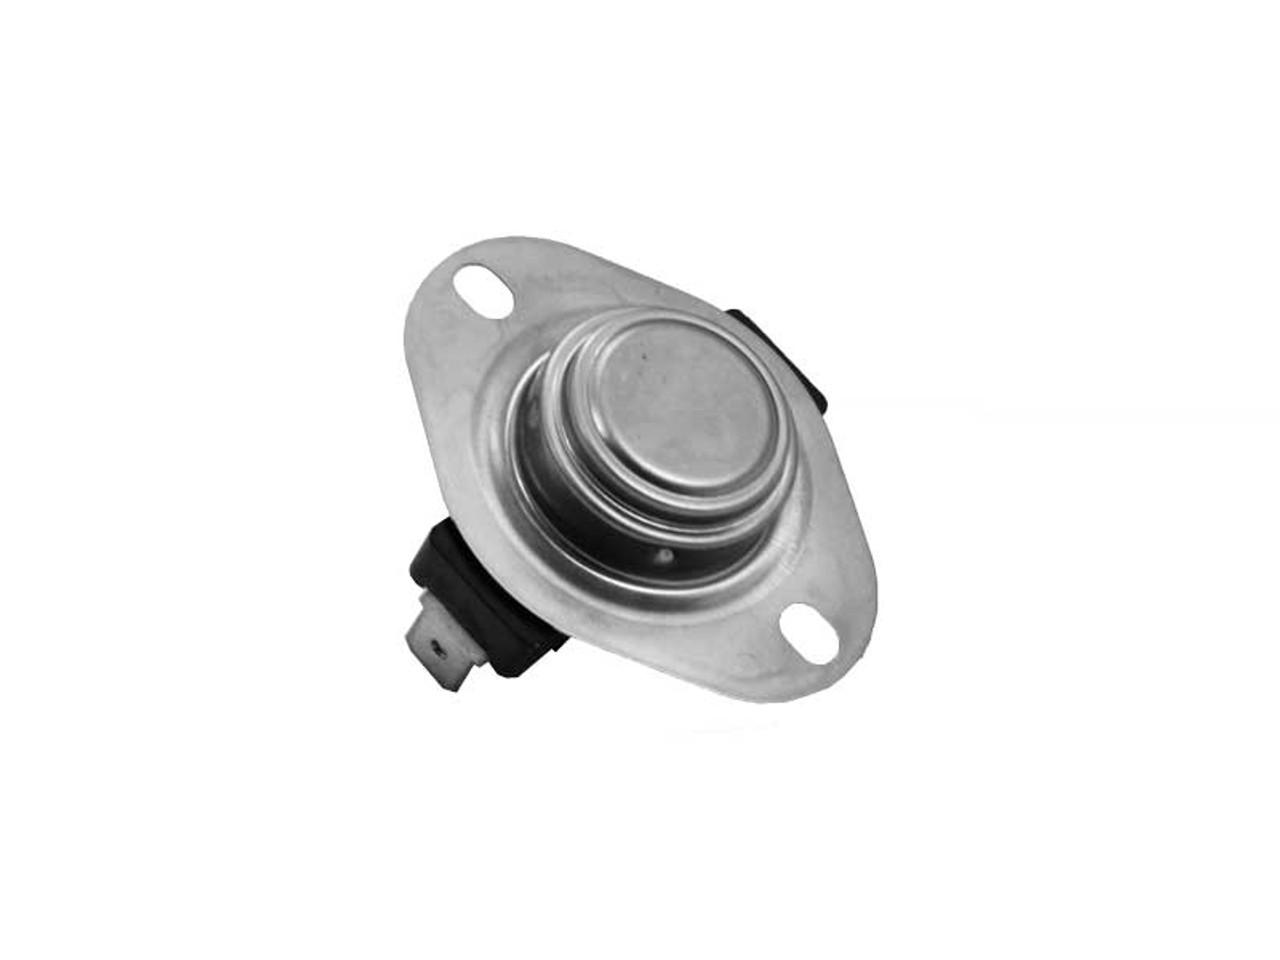 Enviro, Hudson River, Regency & Vista Flame Fan Temp Sensor 160F (13-1160)